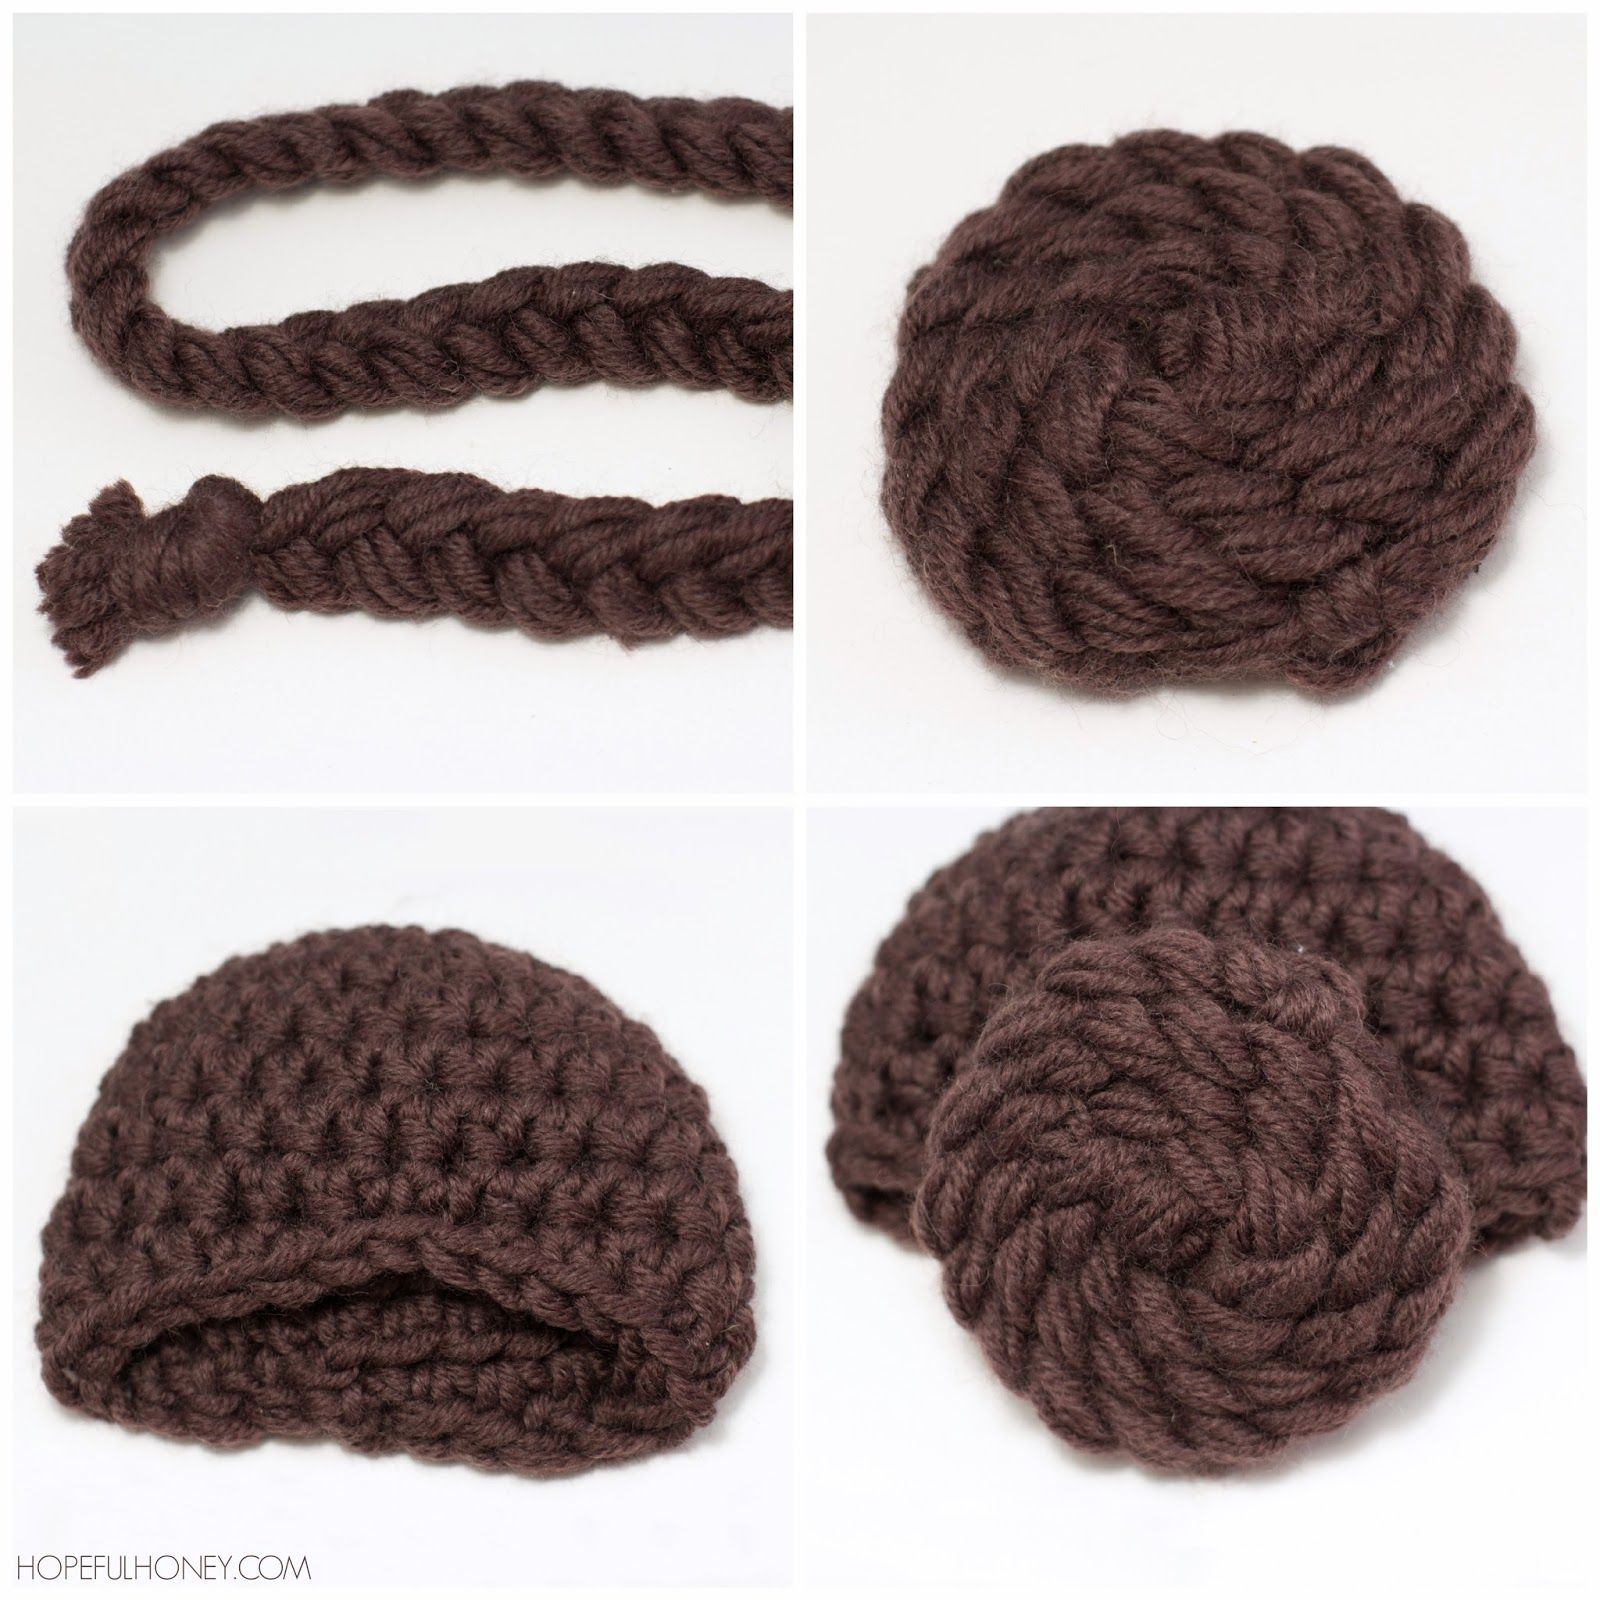 Princess Leia Inspired Beanie Crochet Pattern | Gorros, Tejido y ...